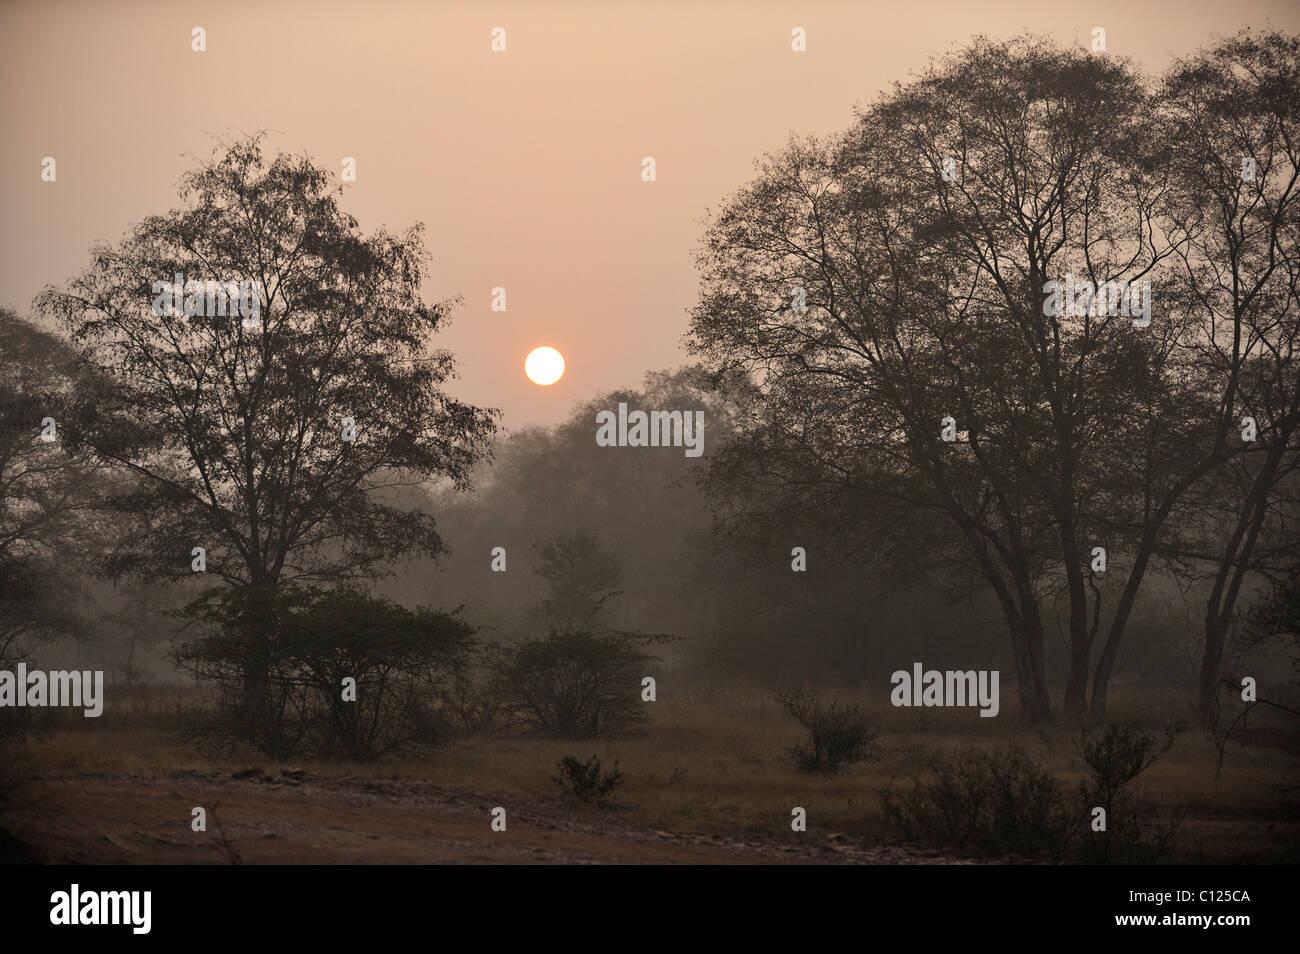 Jungles of Ranthambore National Park at sunrise, Rajasthan, India, Asia Stock Photo